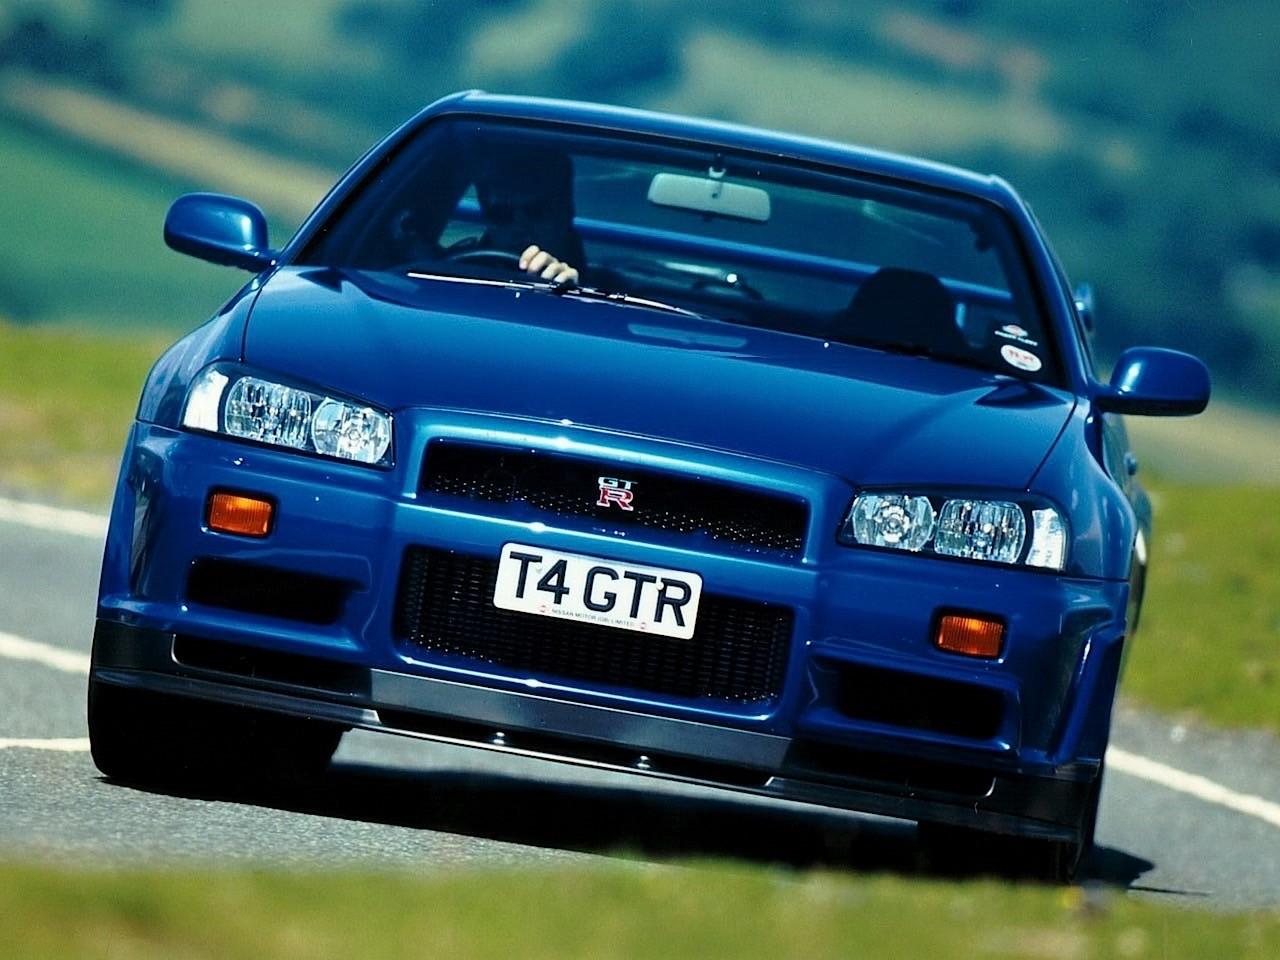 American Auto Parts >> NISSAN Skyline GT-R V-Spec (R34) - 1999, 2000, 2001, 2002 - autoevolution